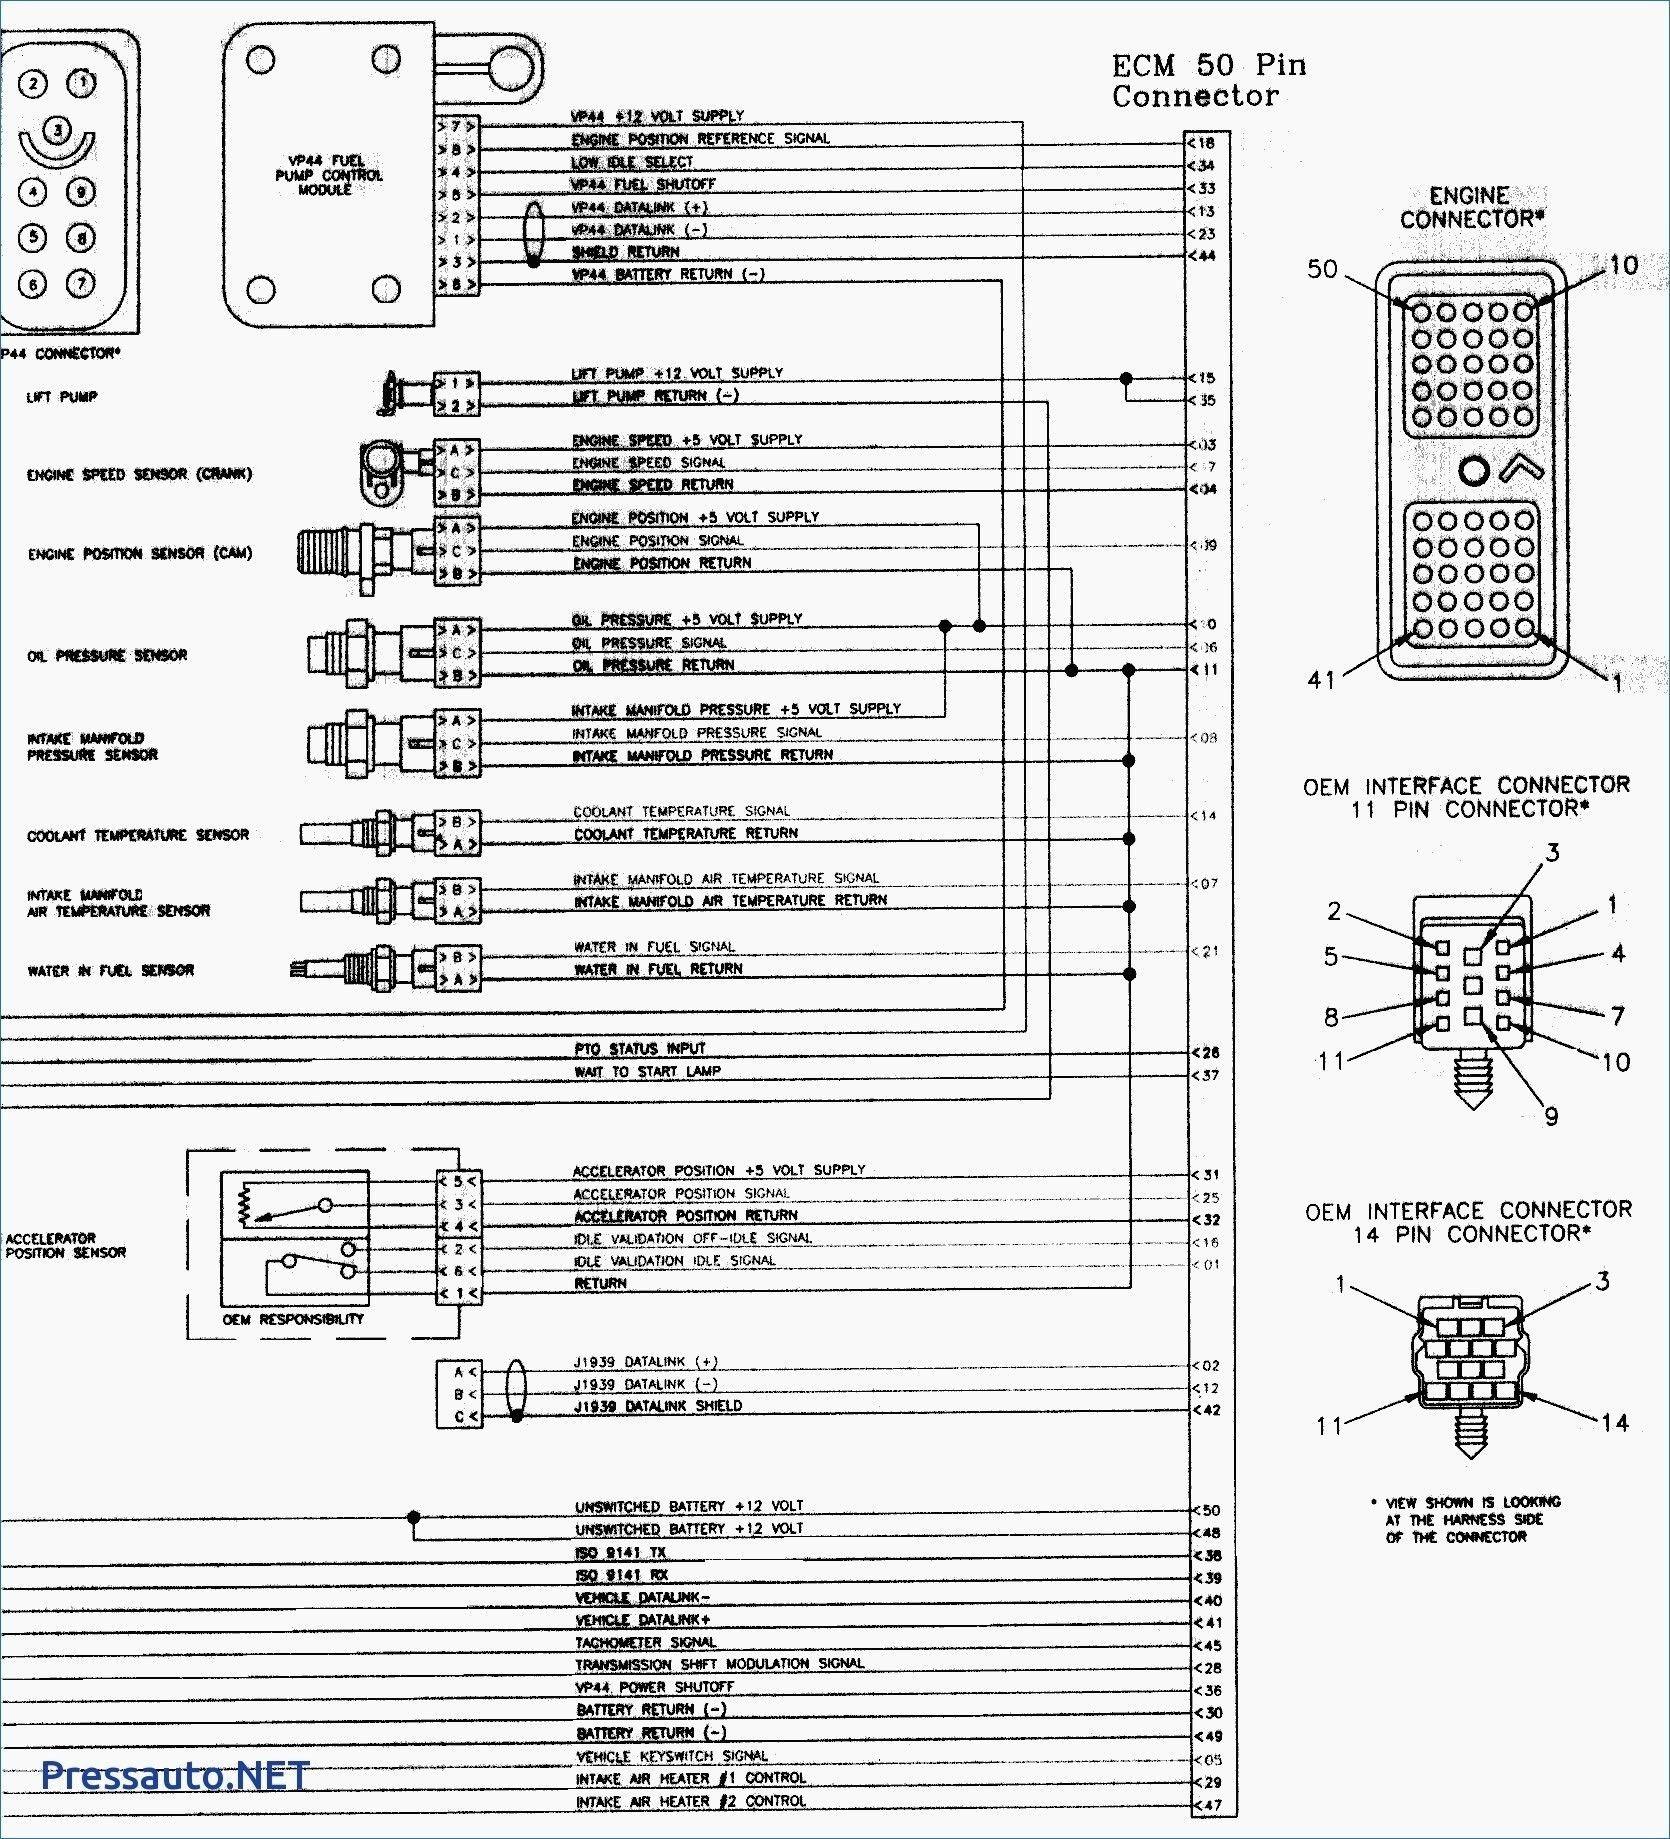 Wiring Diagram Anybody Ram 1500 2004 2004 Dodge Ram 1500 Engine Diagram Wiring Diagram